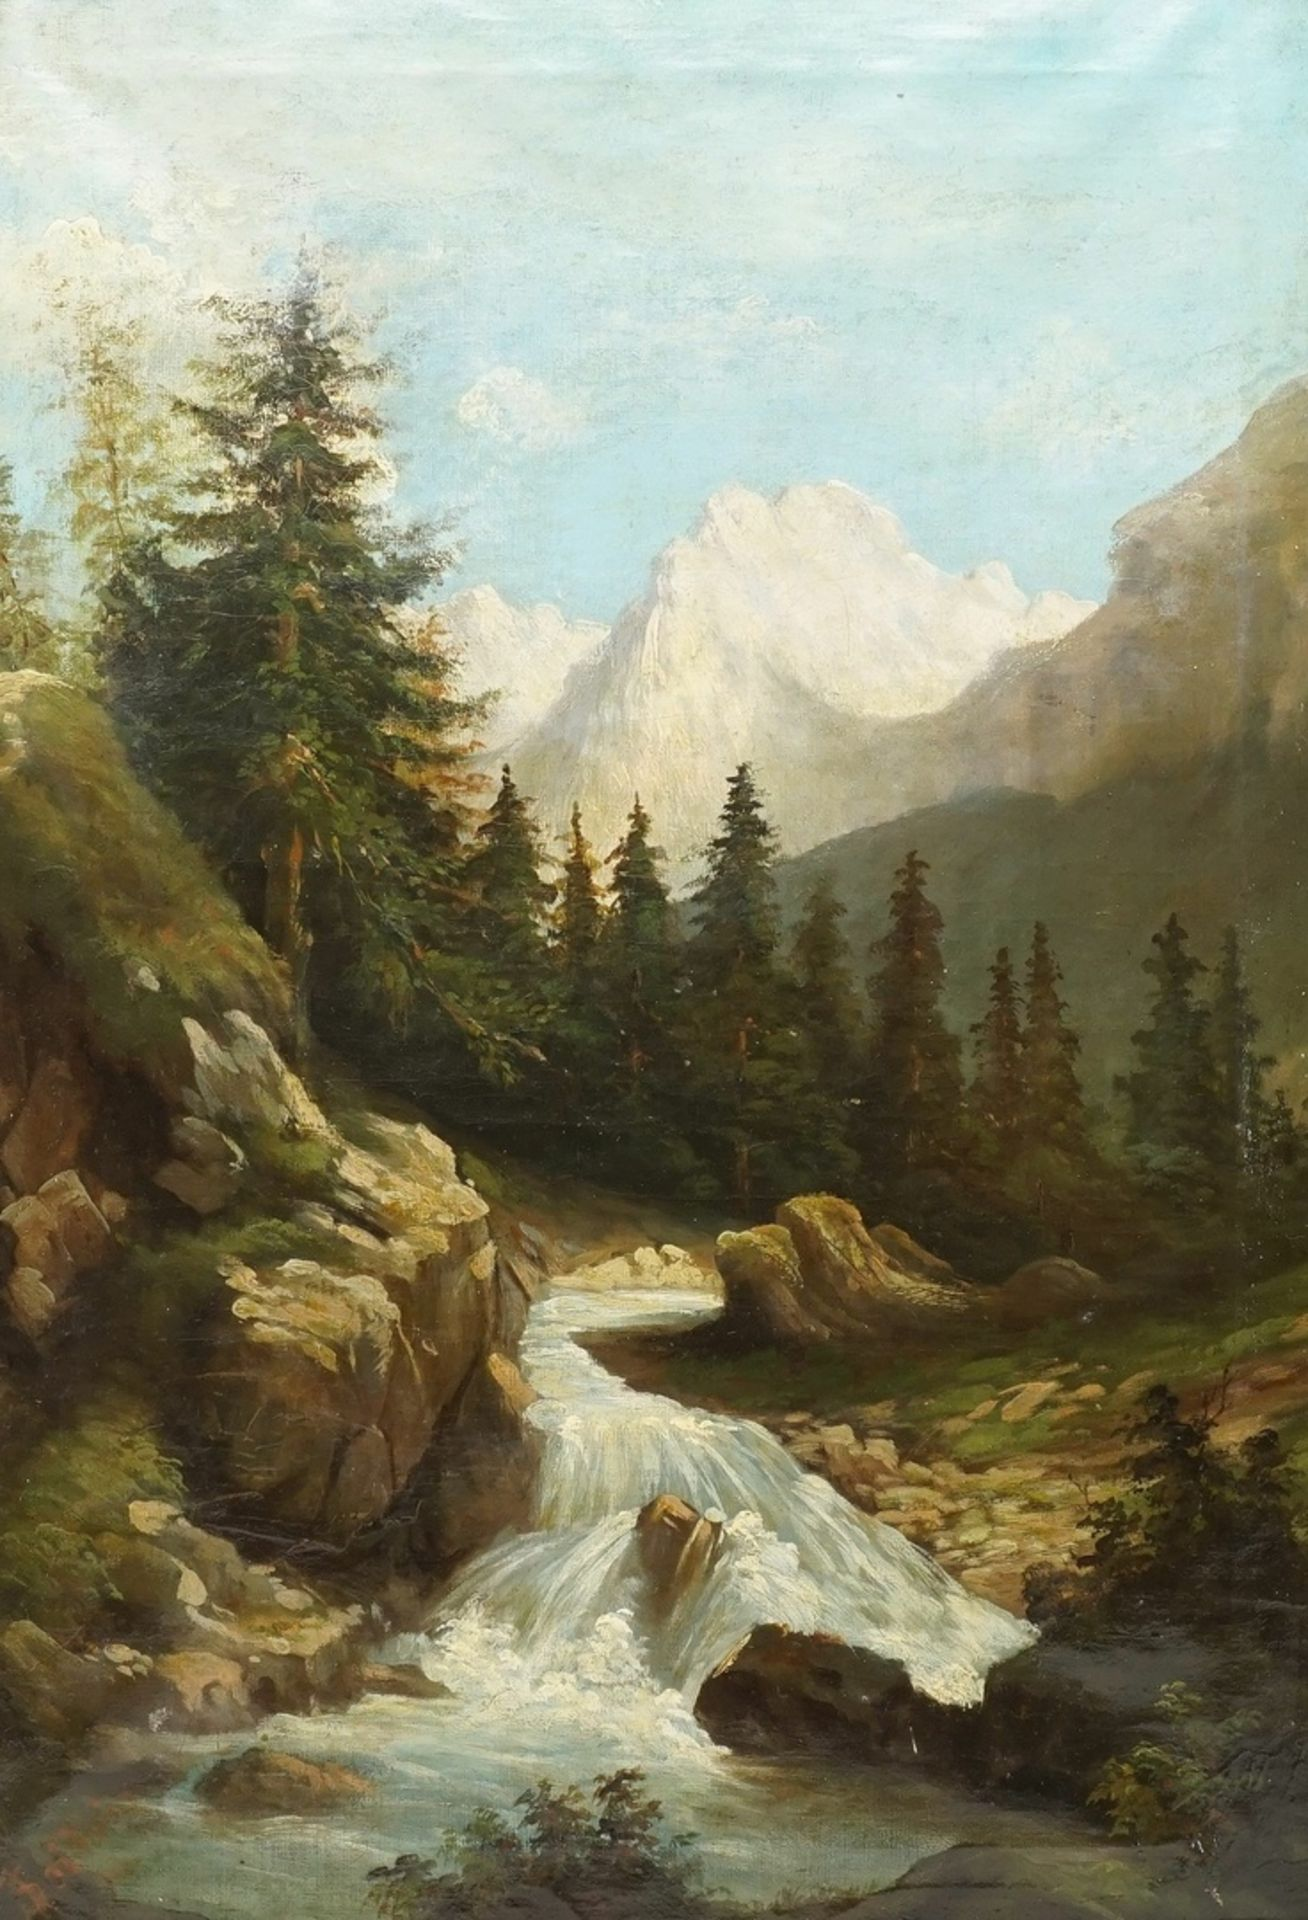 J. Seidlein, Alpenbach in den Dolomiten